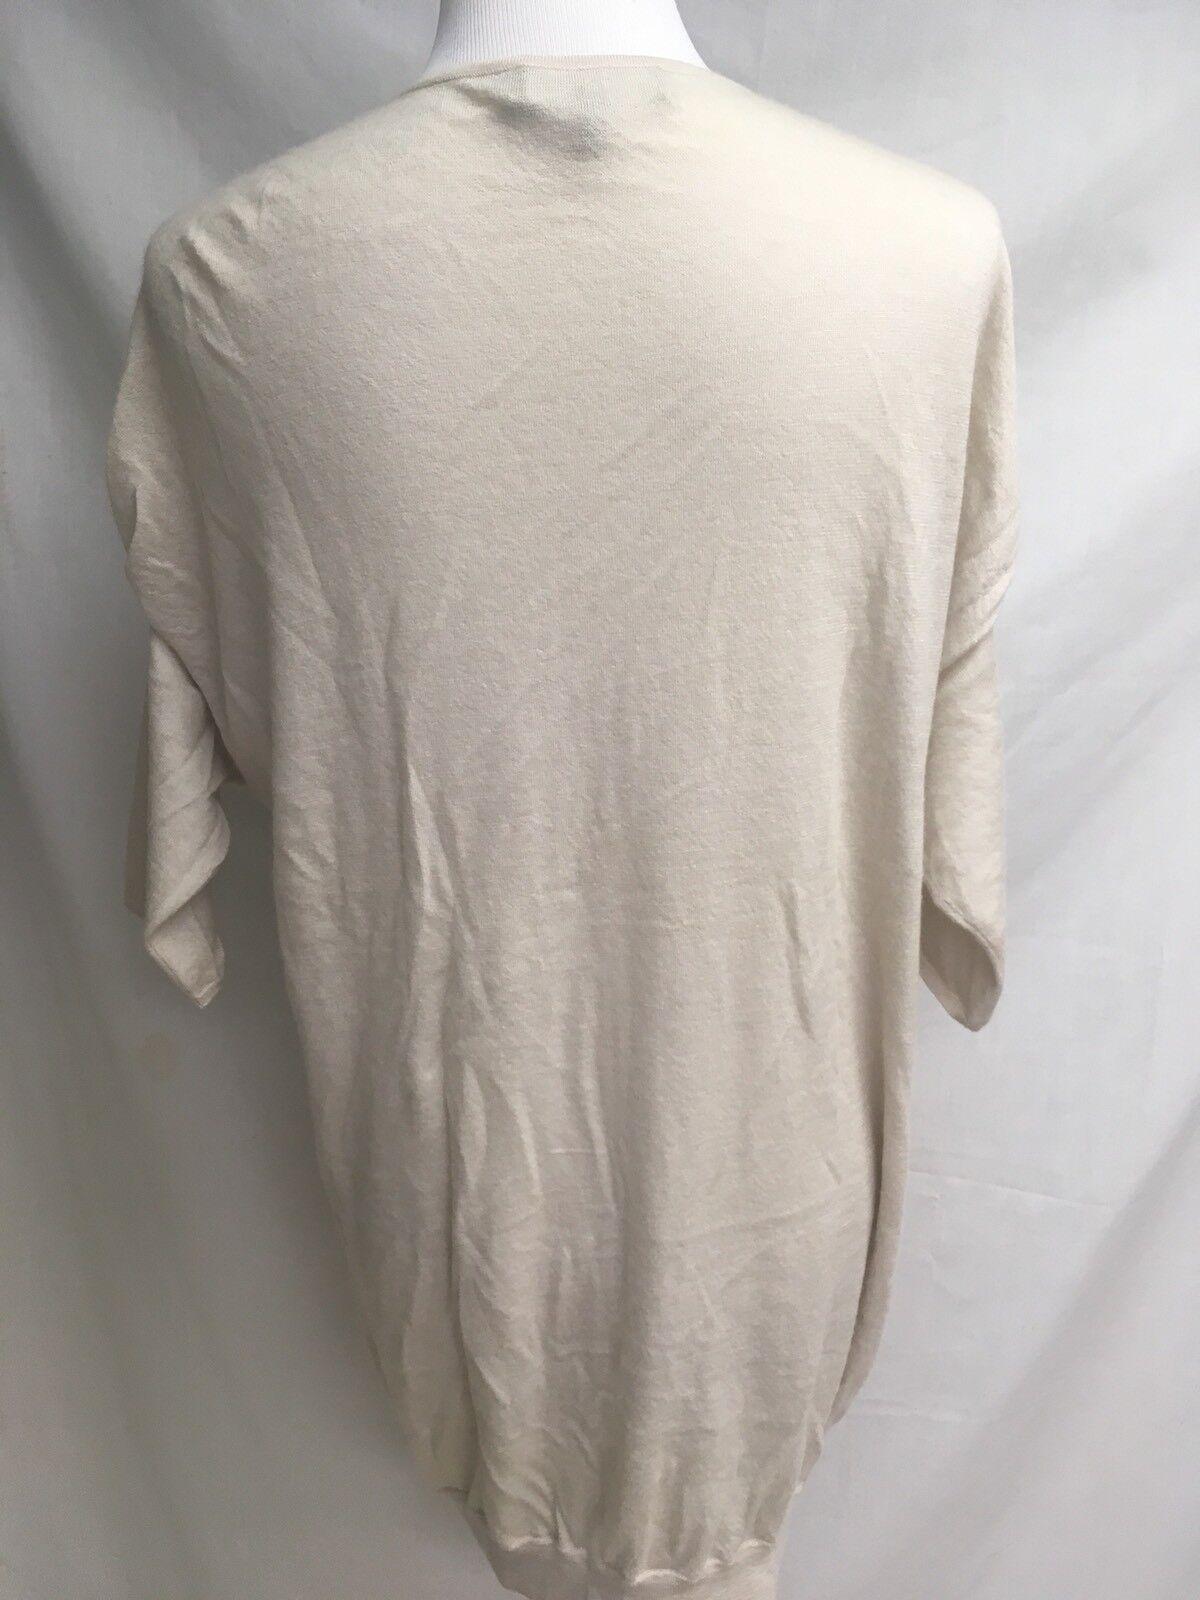 Robert Rodriquez Light Weight Cream 100% 100% 100% Cashemere Sweater   300.00 Value 62db31